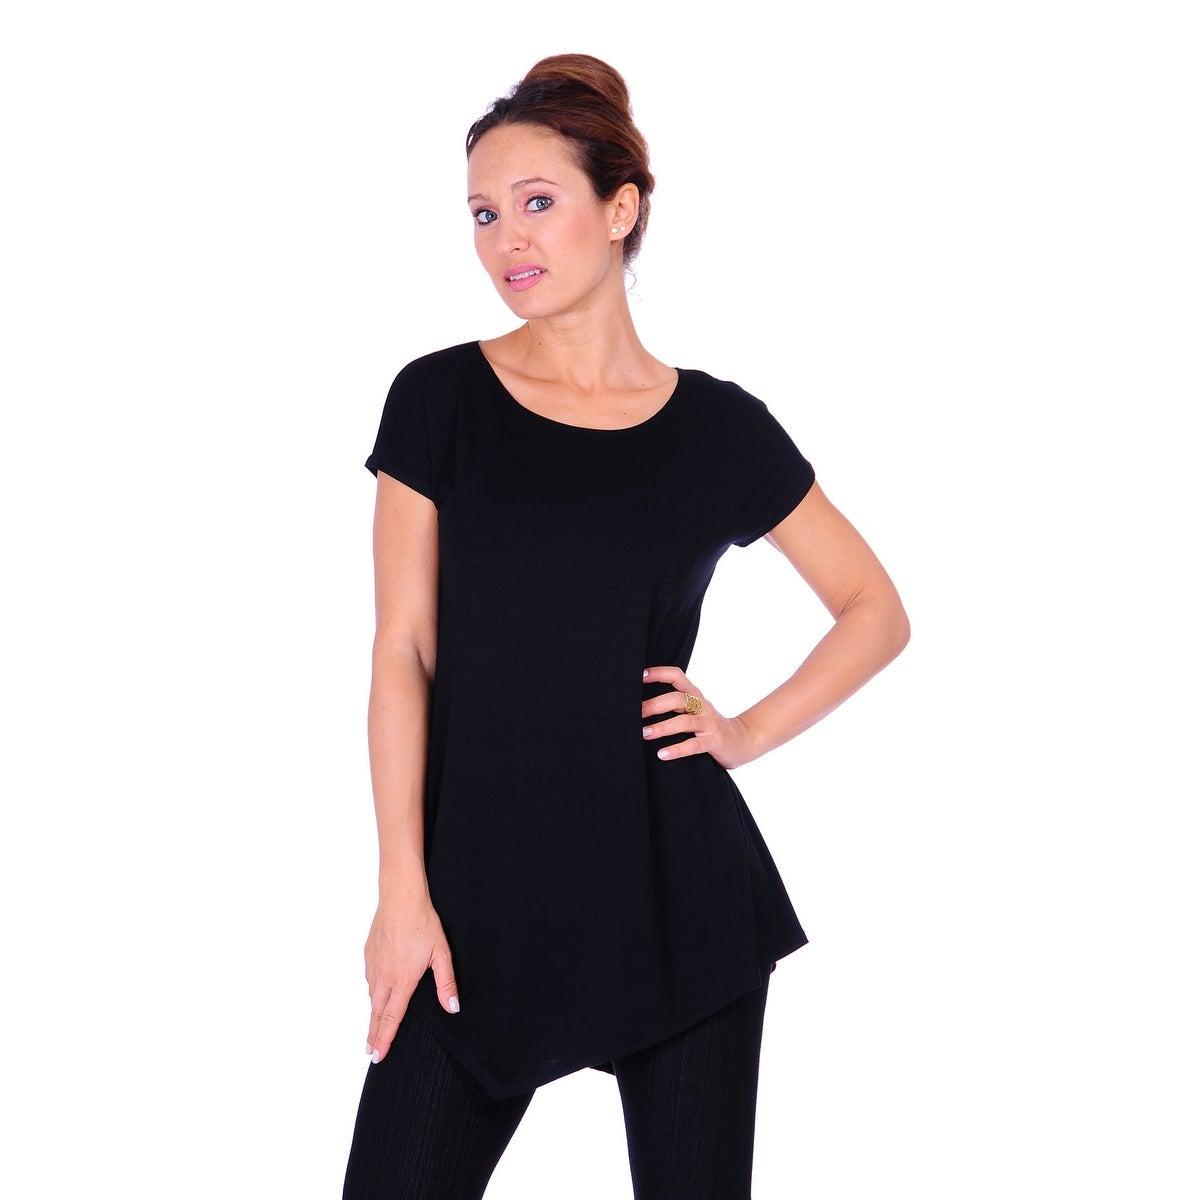 Simply Ravishing Women's Assymetrical Front/Back Handkerchief Hem Sleeveless Tunic Top - Thumbnail 6